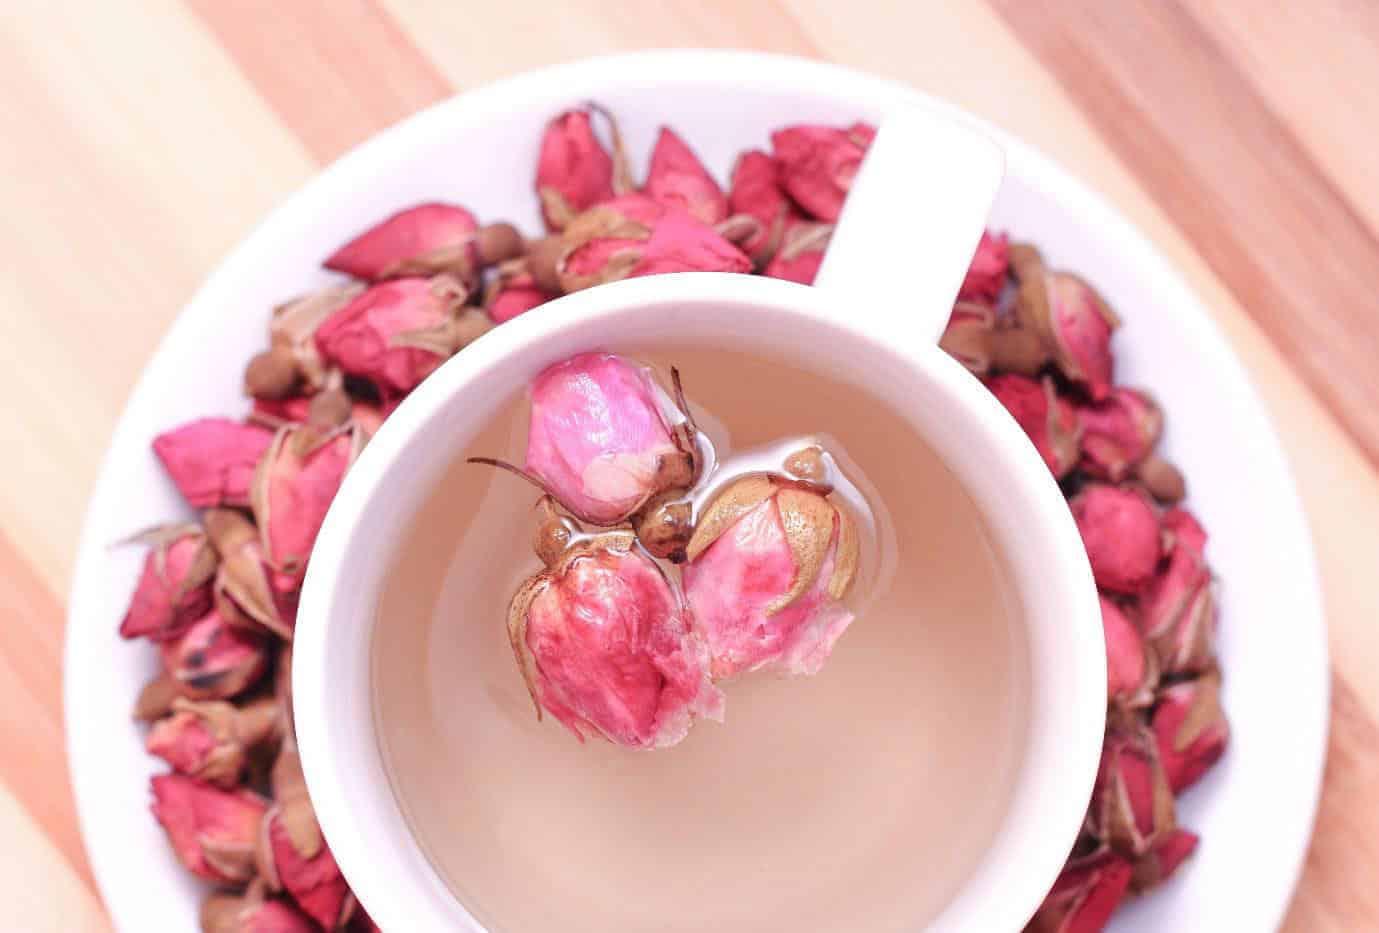 شاي ورد - orchidfulifestyle